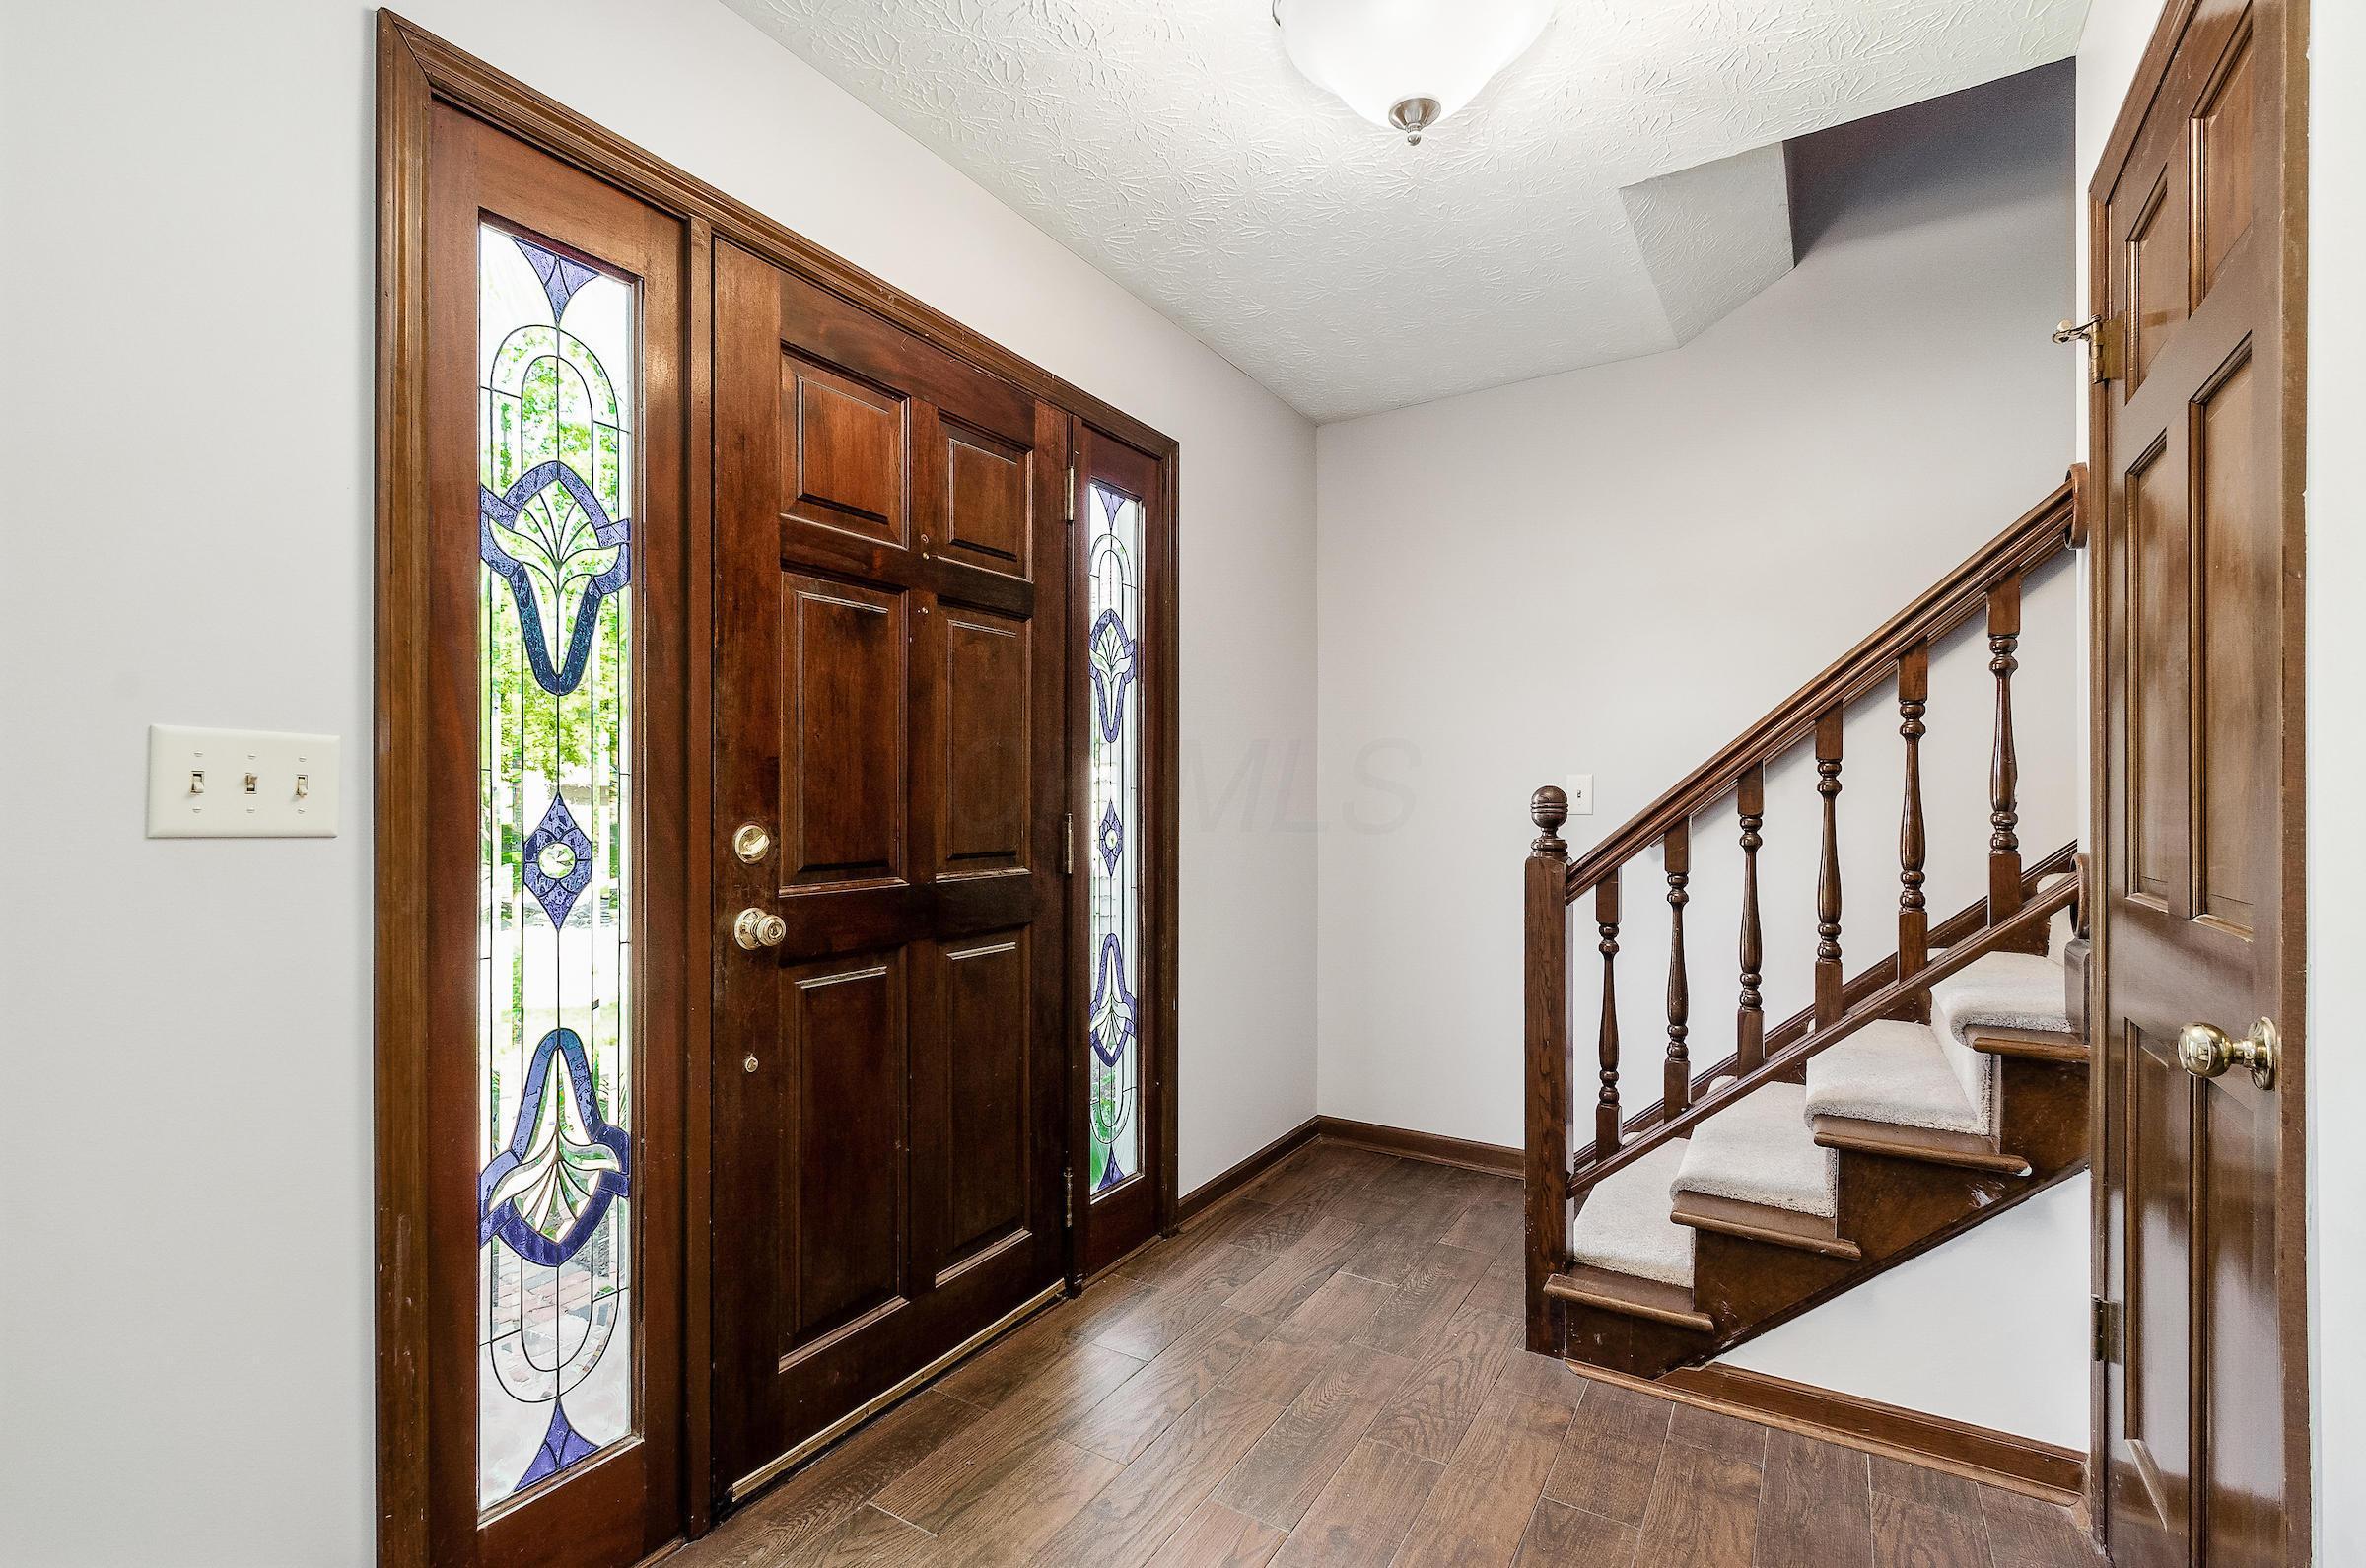 8870 Braids Court, Dublin, Ohio 43017, 4 Bedrooms Bedrooms, ,3 BathroomsBathrooms,Residential,For Sale,Braids,220018841